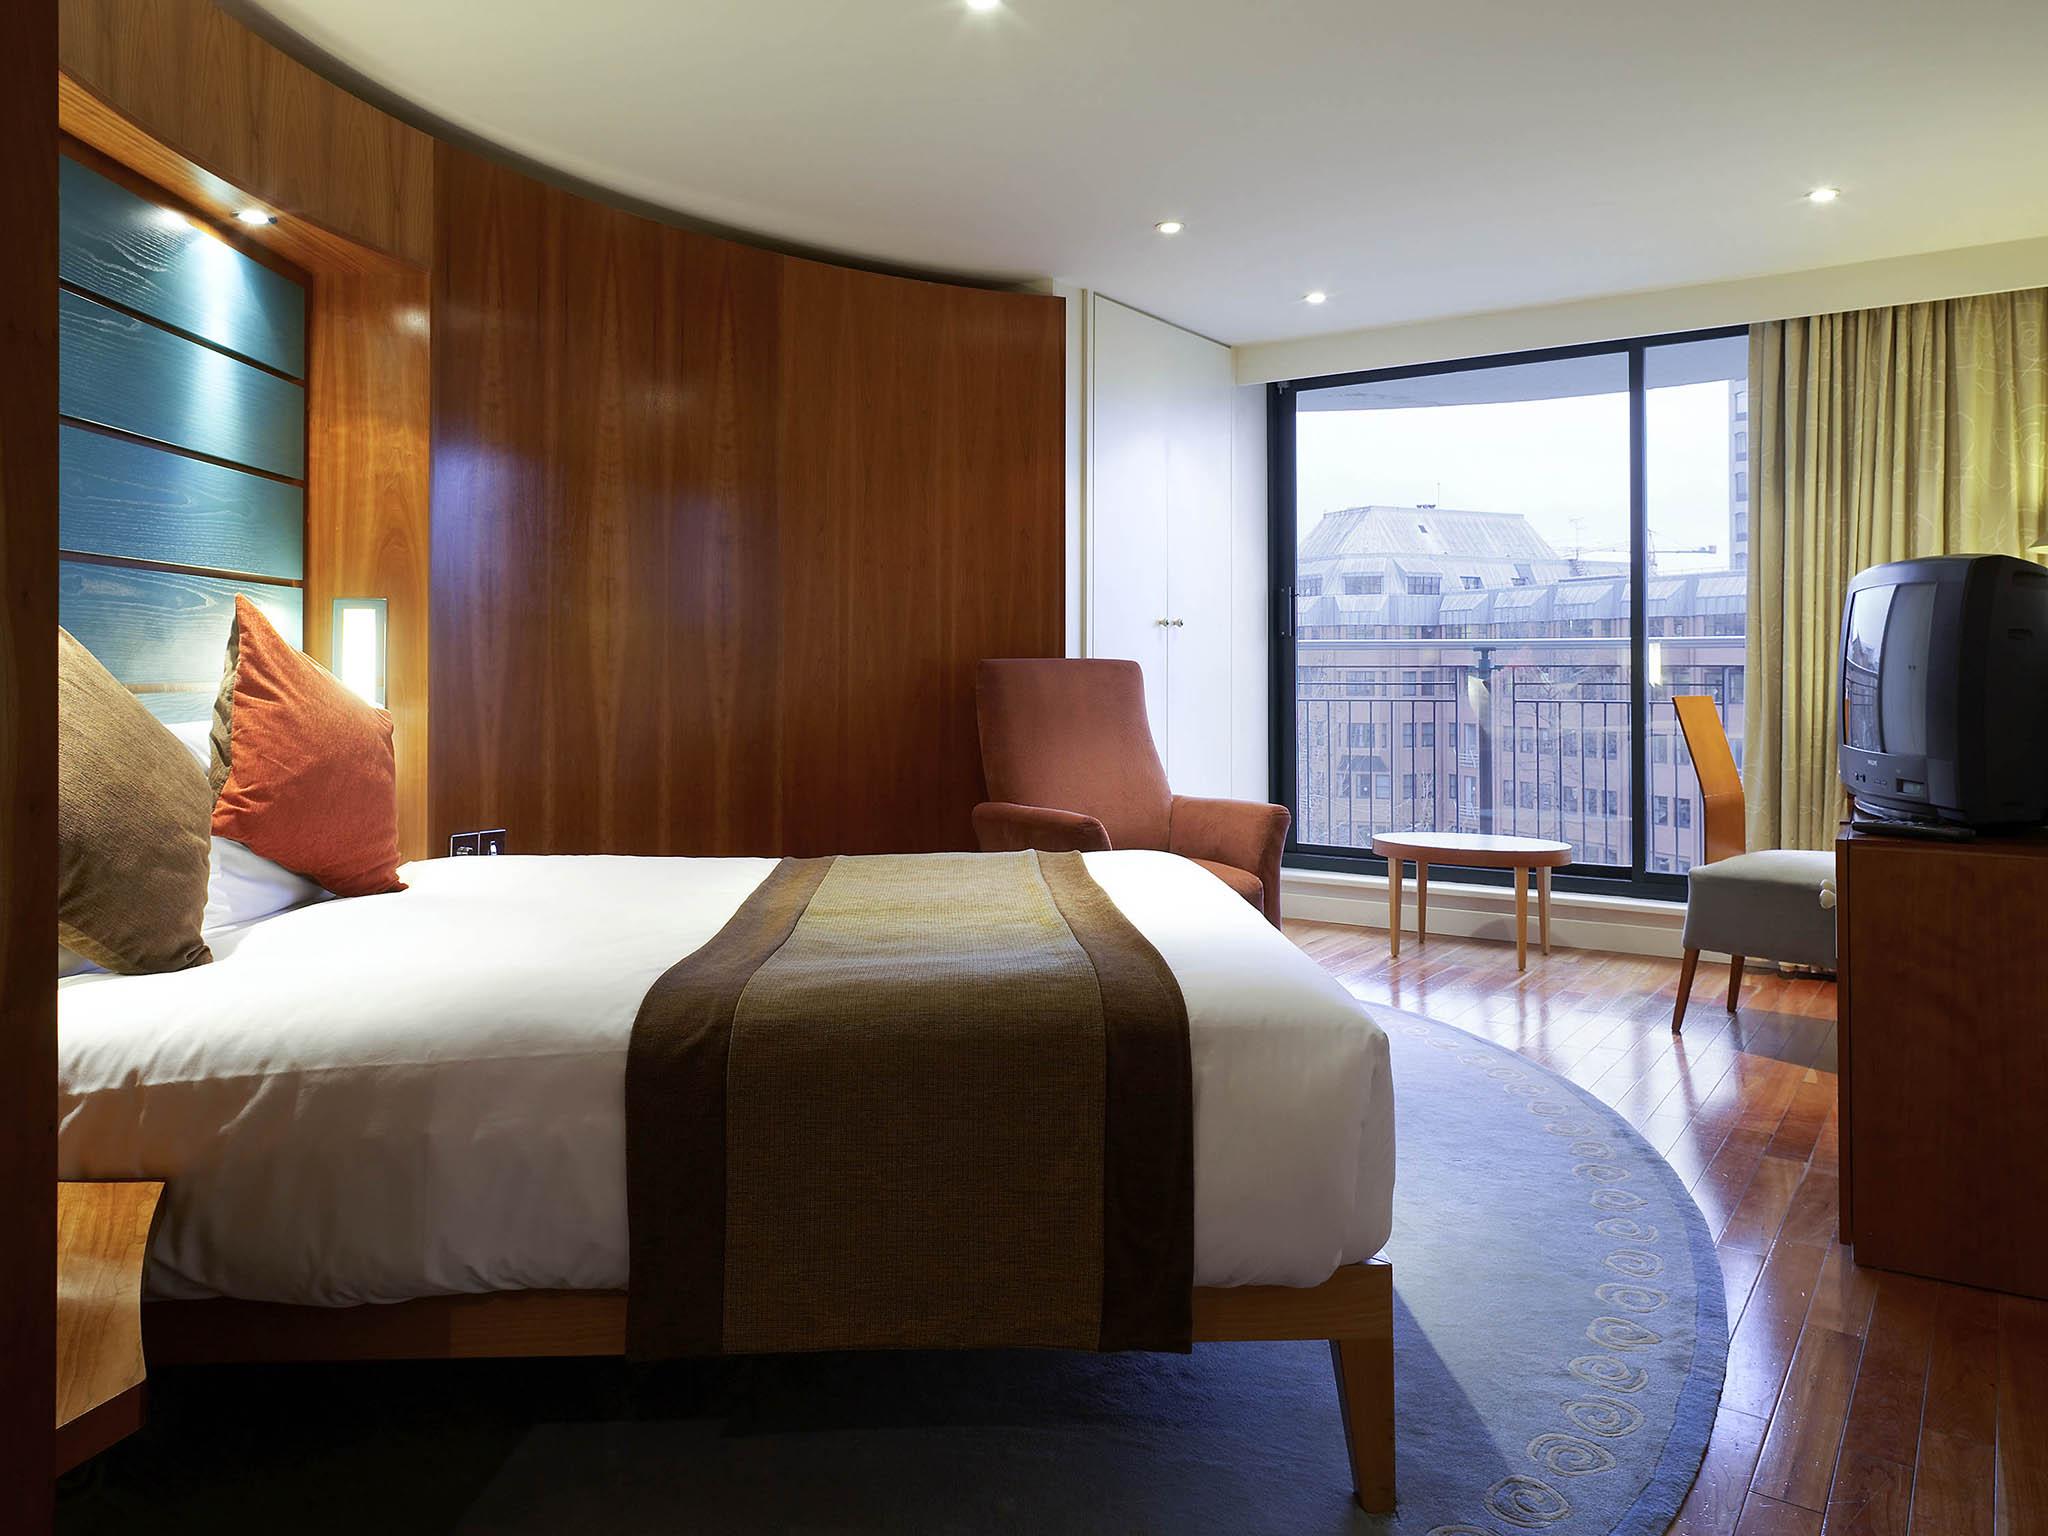 Rooms Mercure Bristol Brigstow Hotel